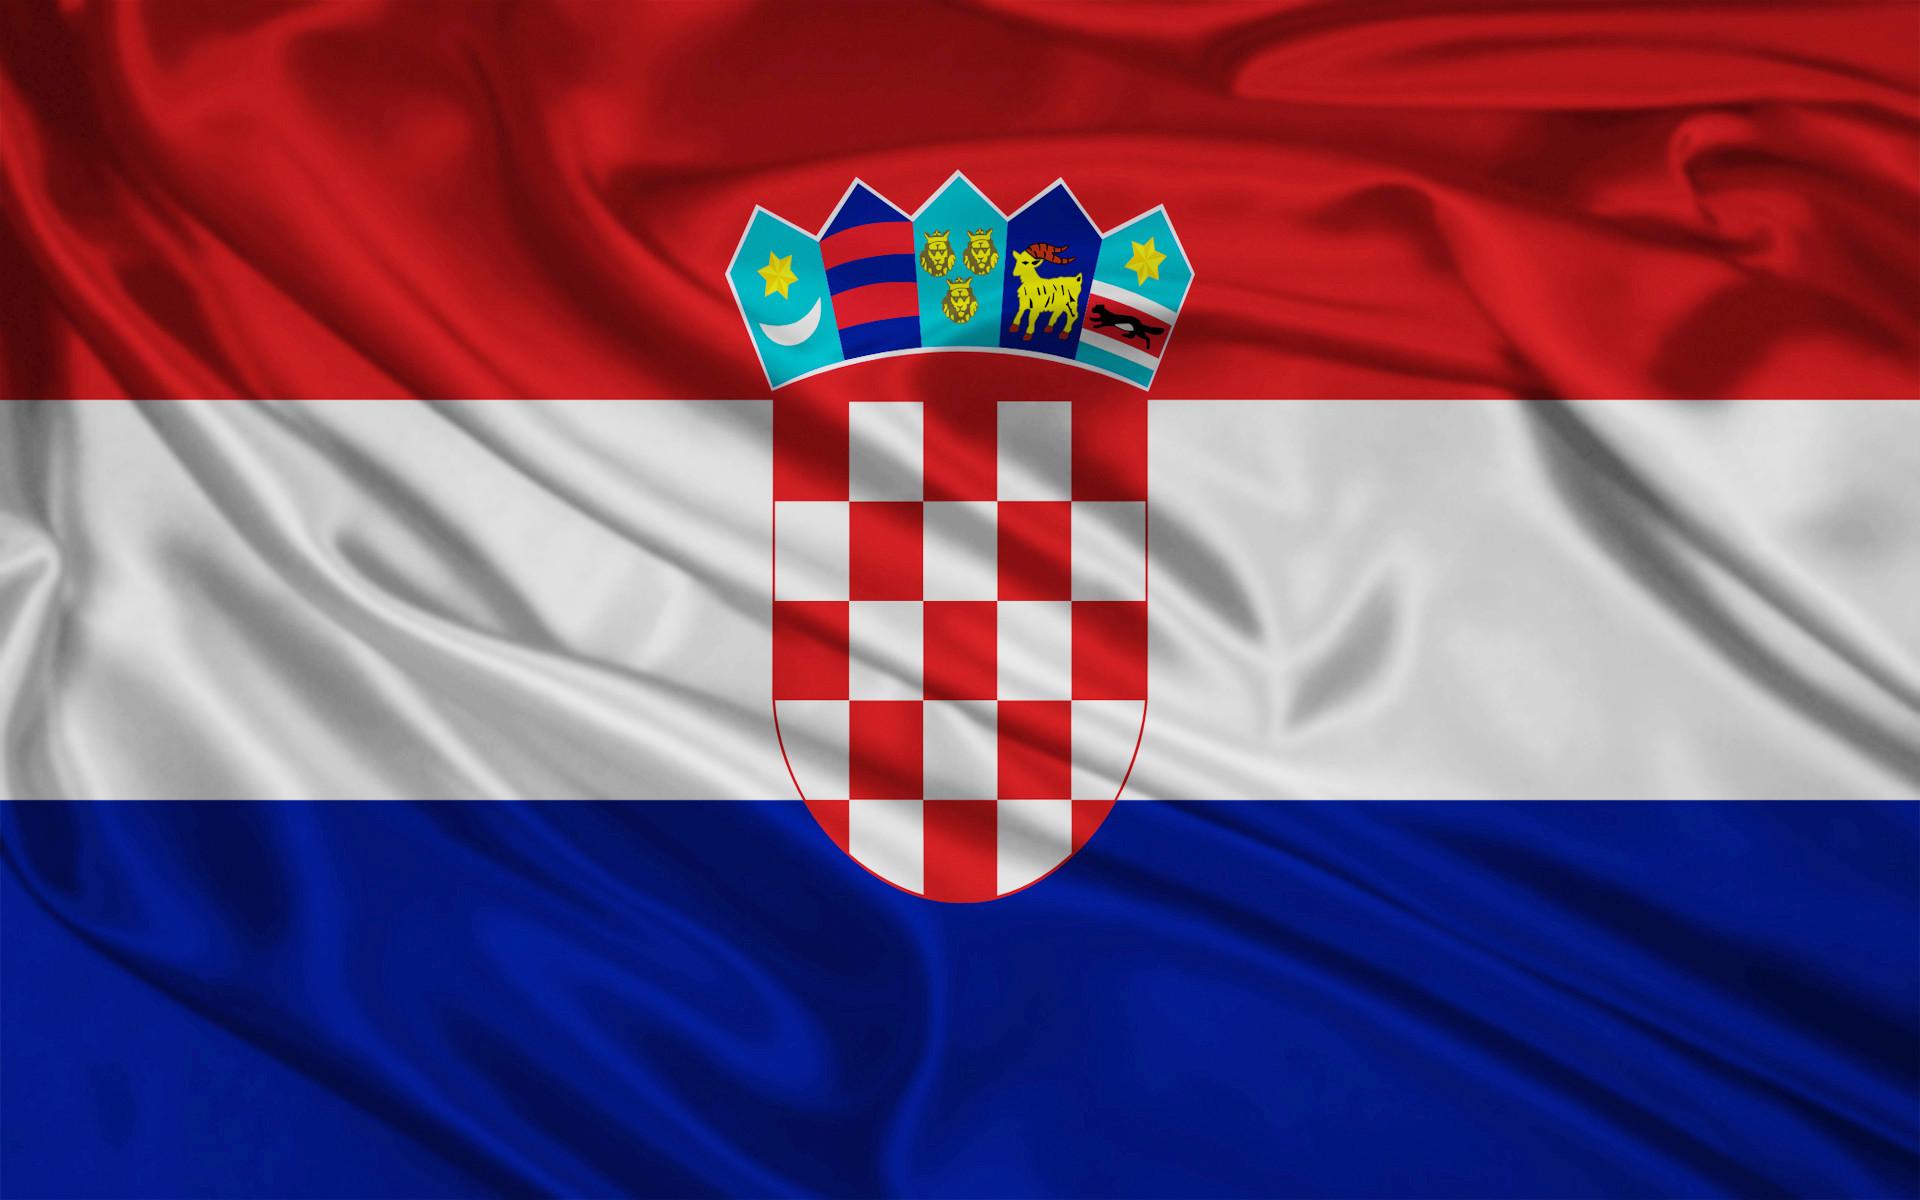 Previous: Croatia Flag …